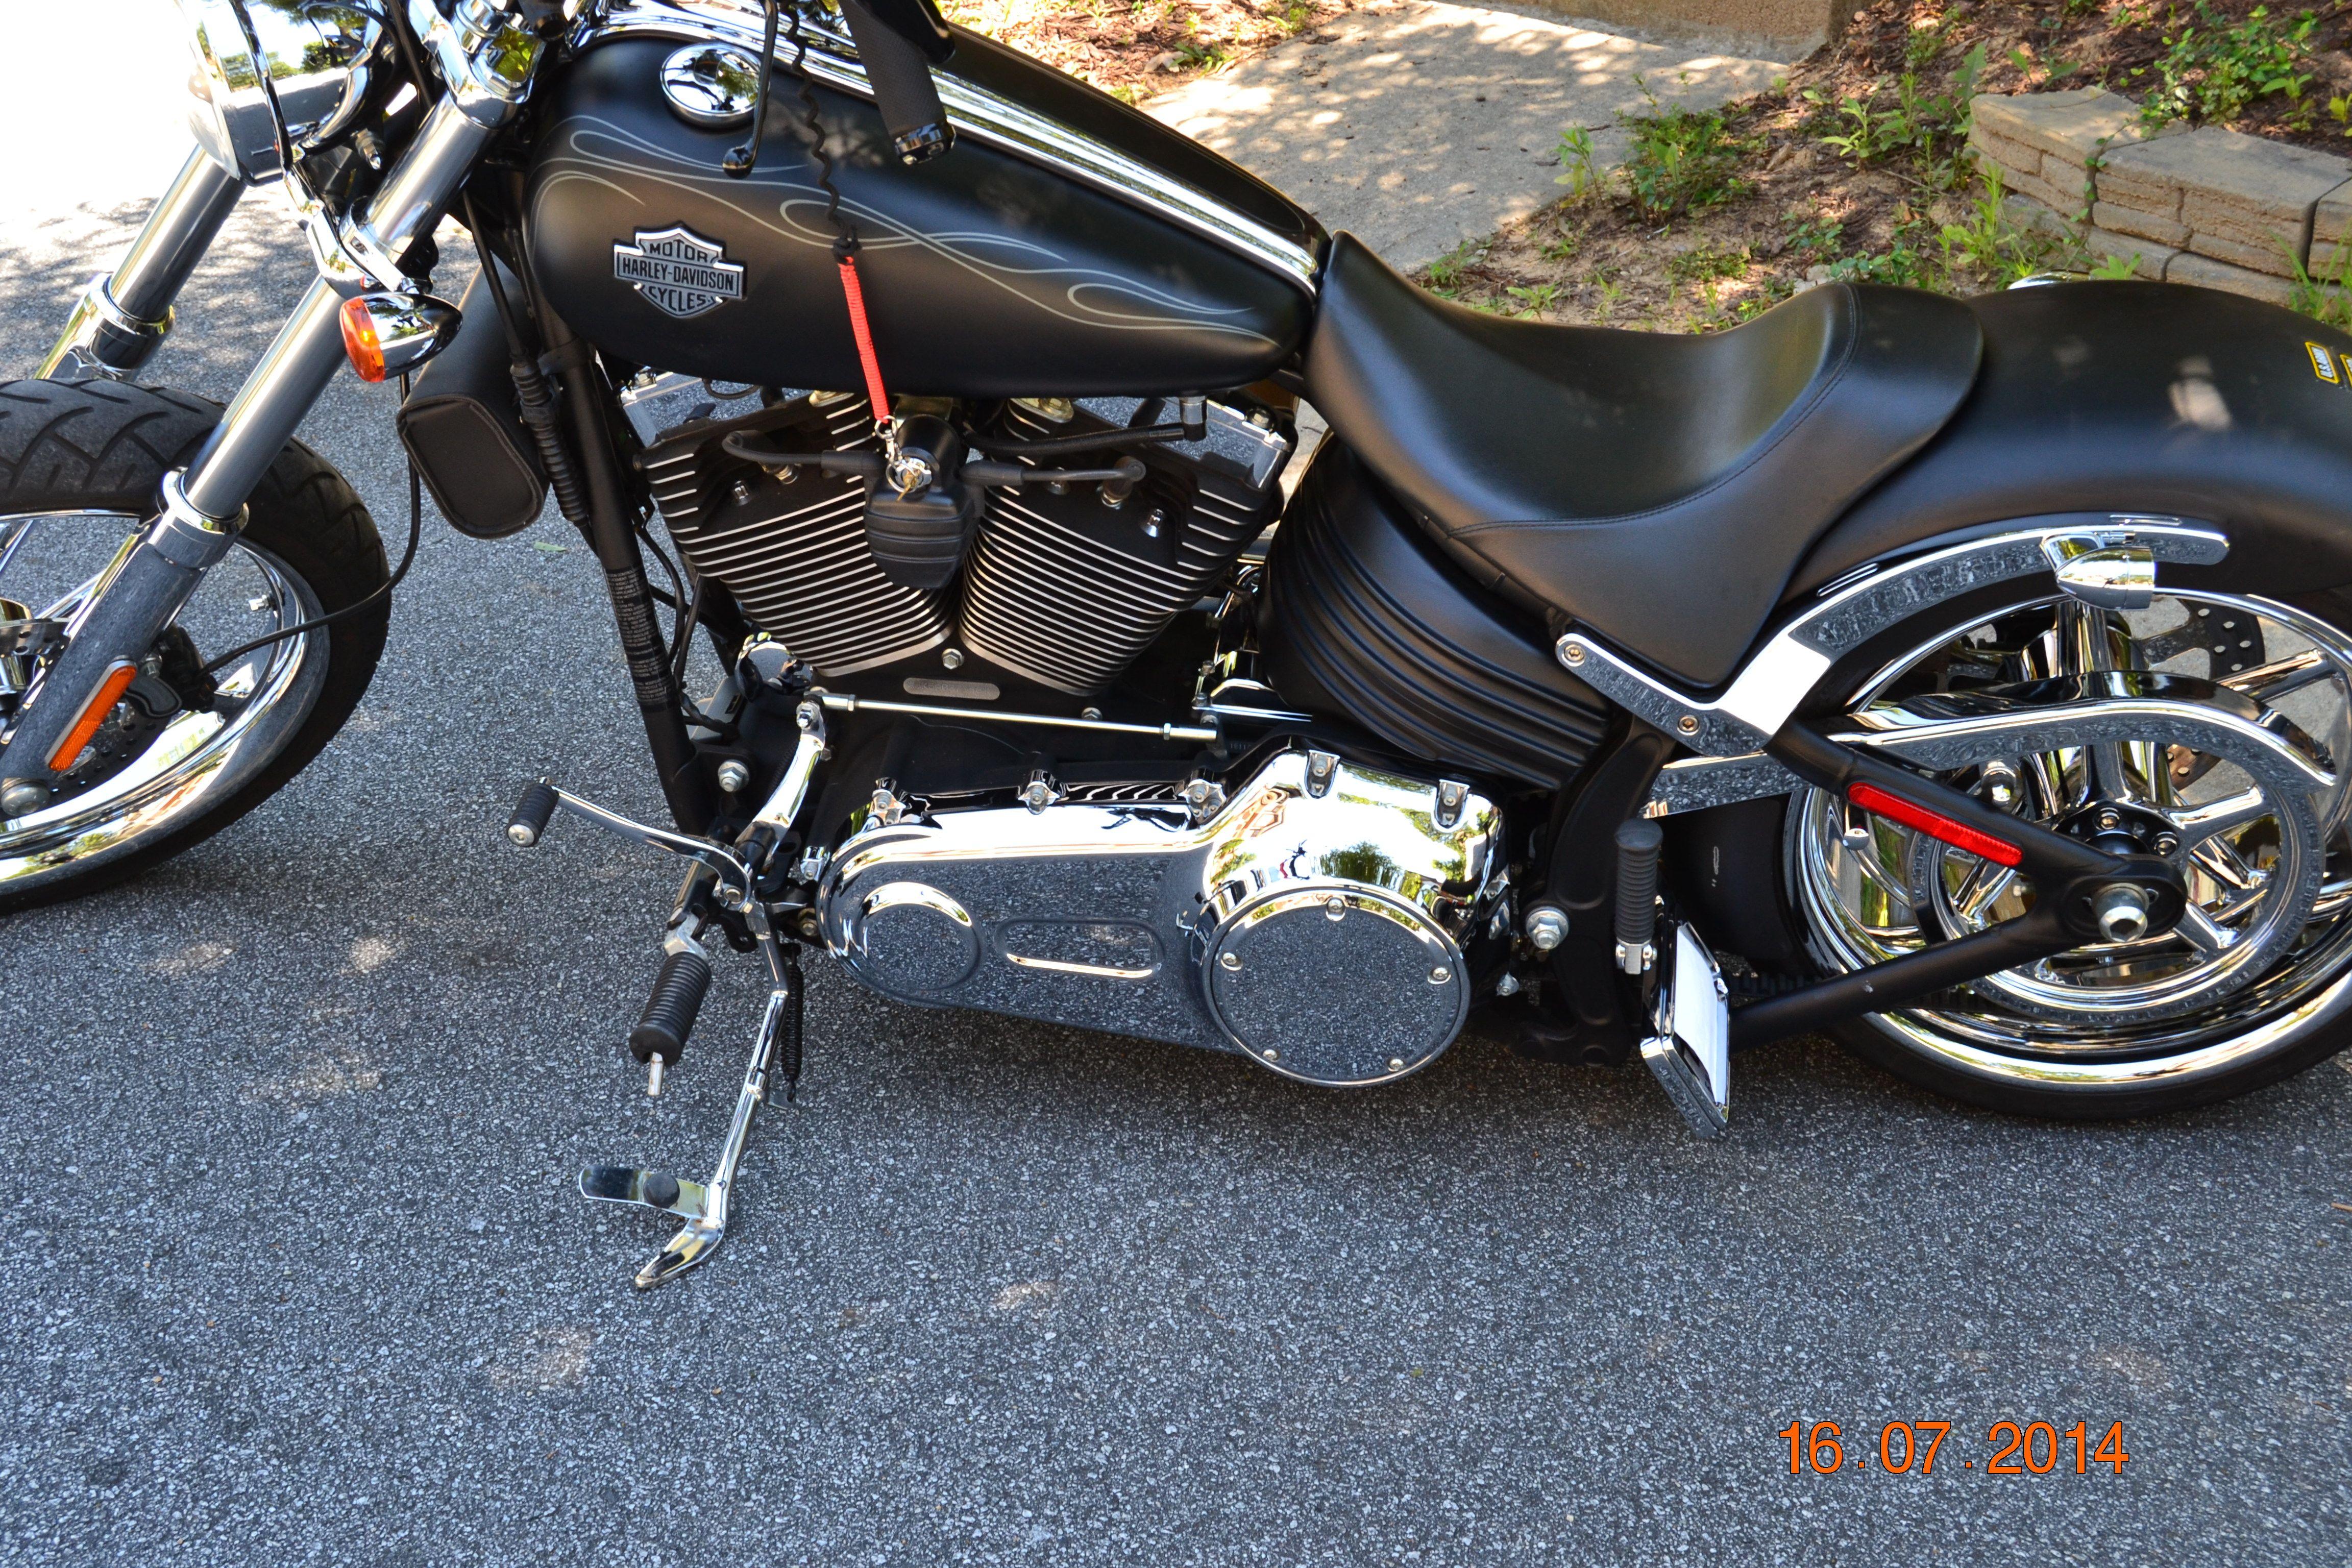 2010 Harley Davidson Rocker C Cool Bikes